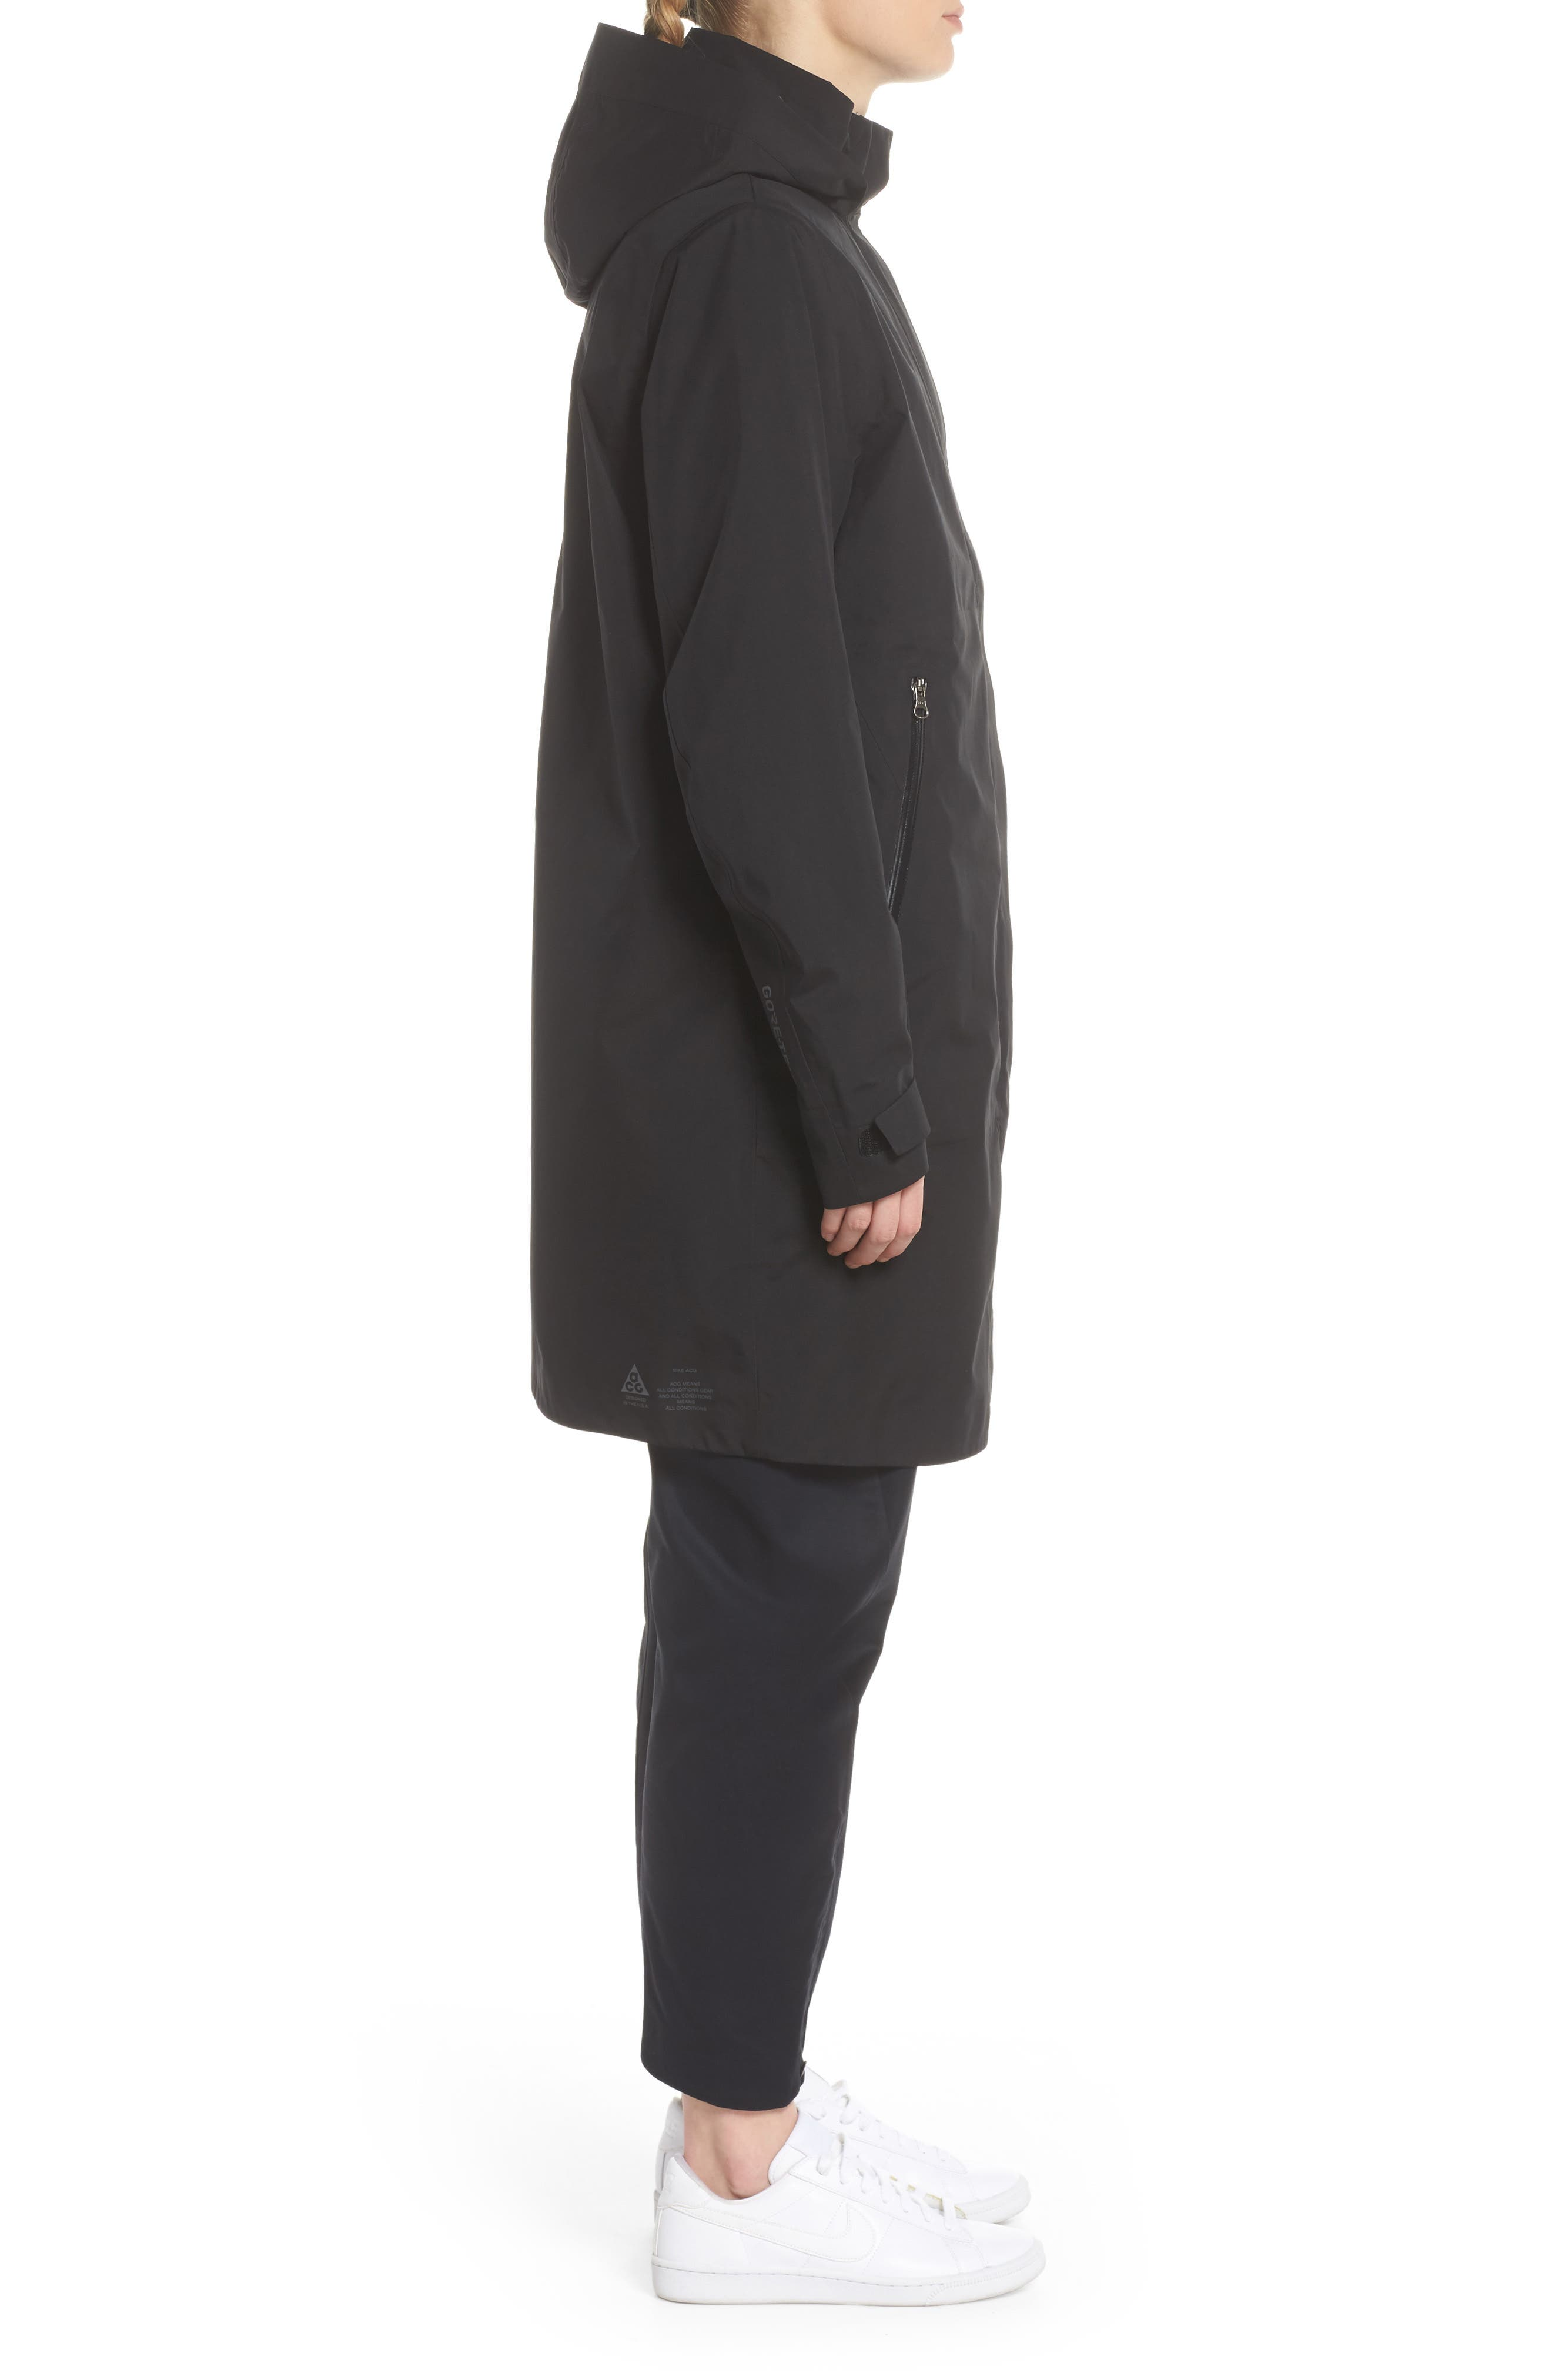 NikeLab ACG 3-in-1 System Women's Coat,                             Alternate thumbnail 4, color,